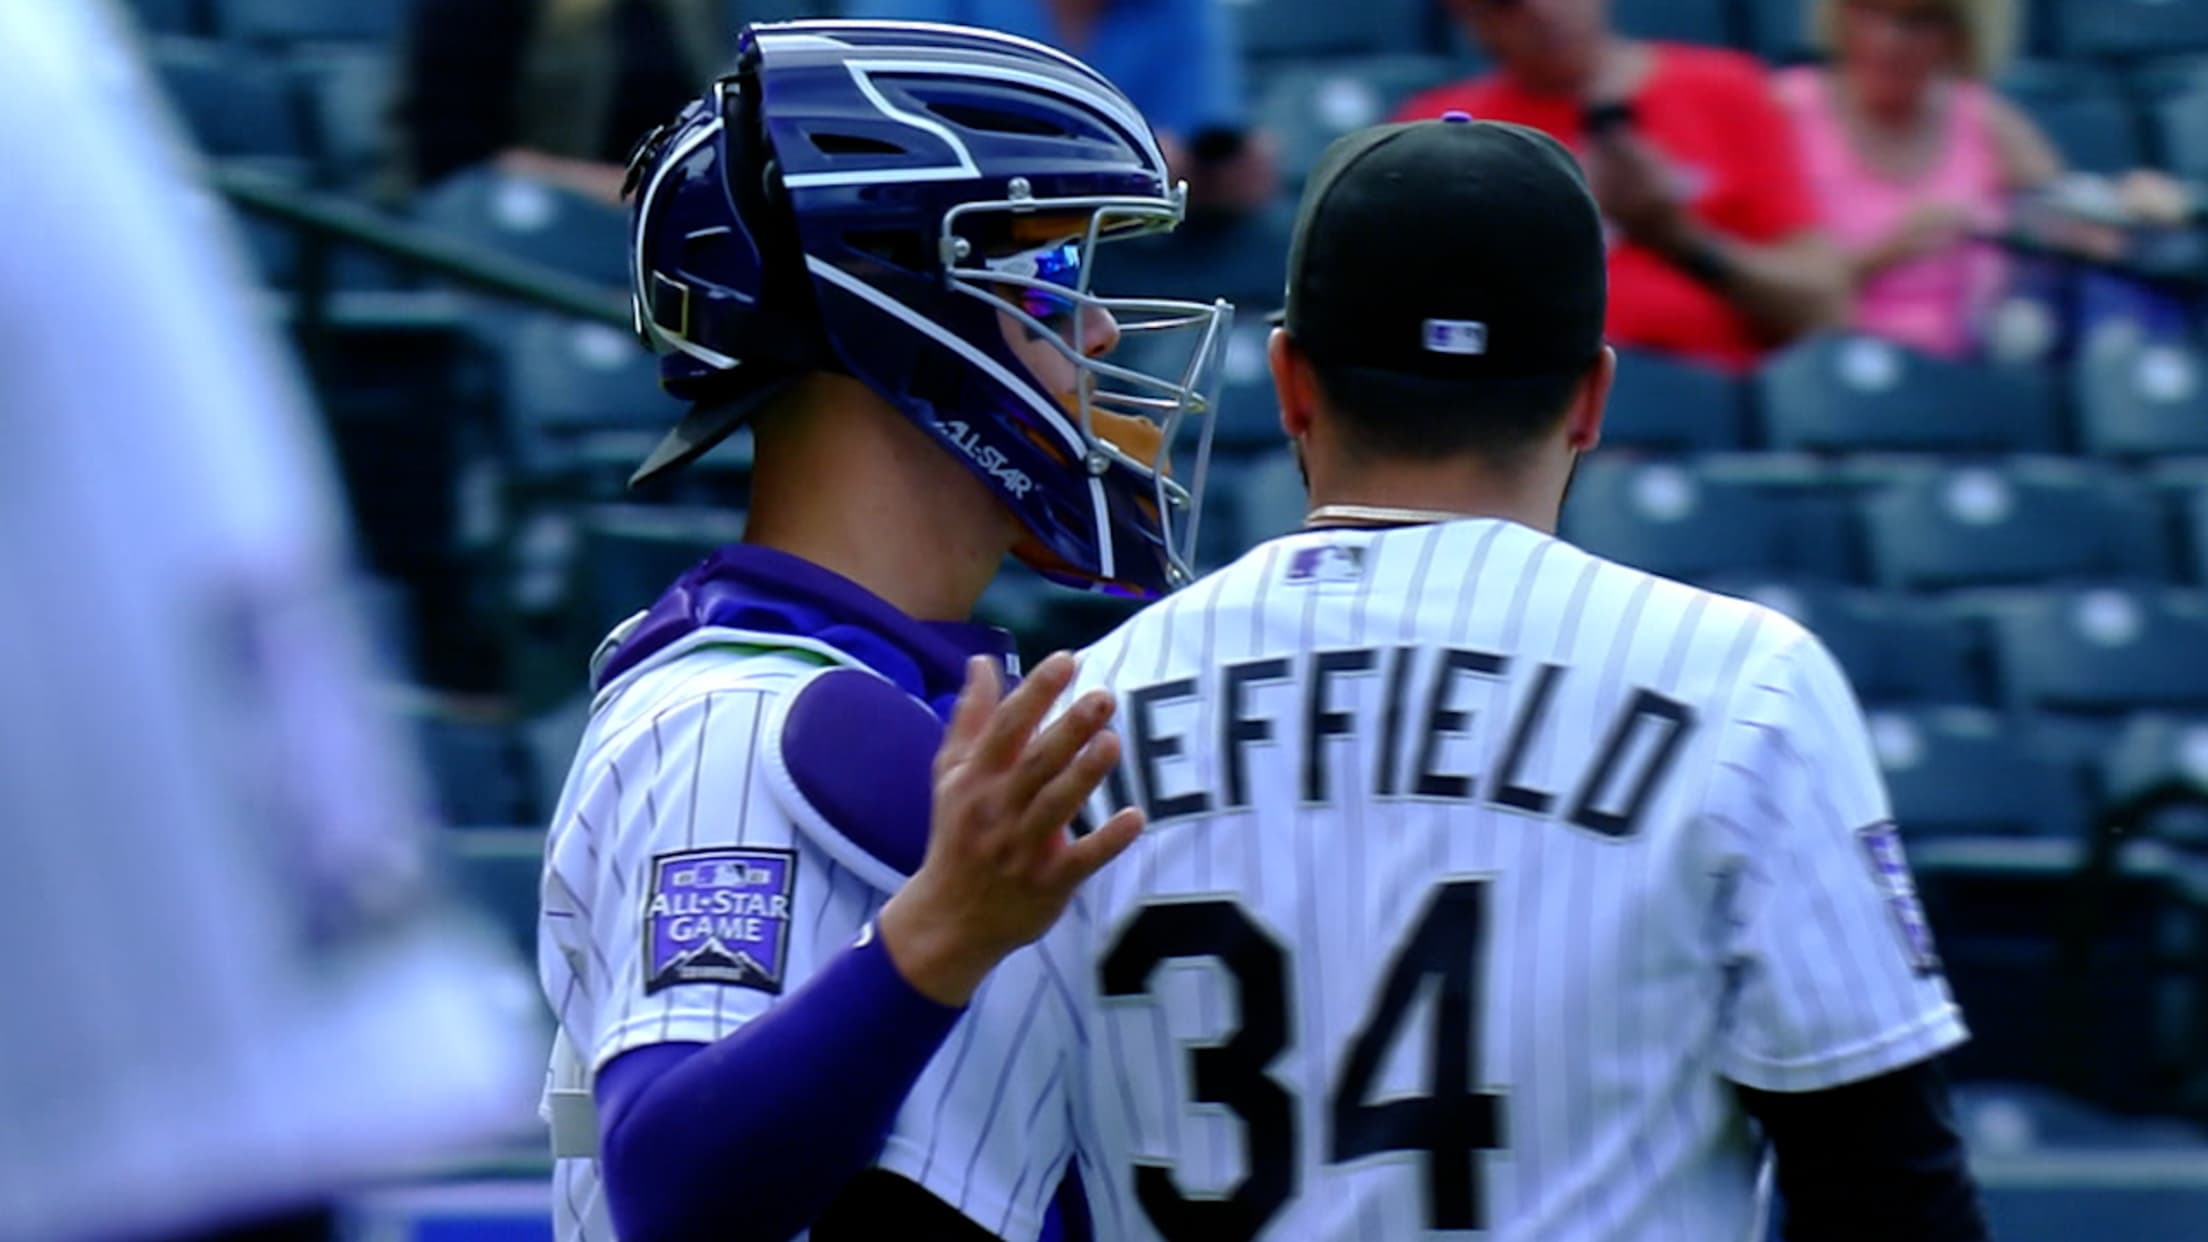 Jordan Sheffield ends the game